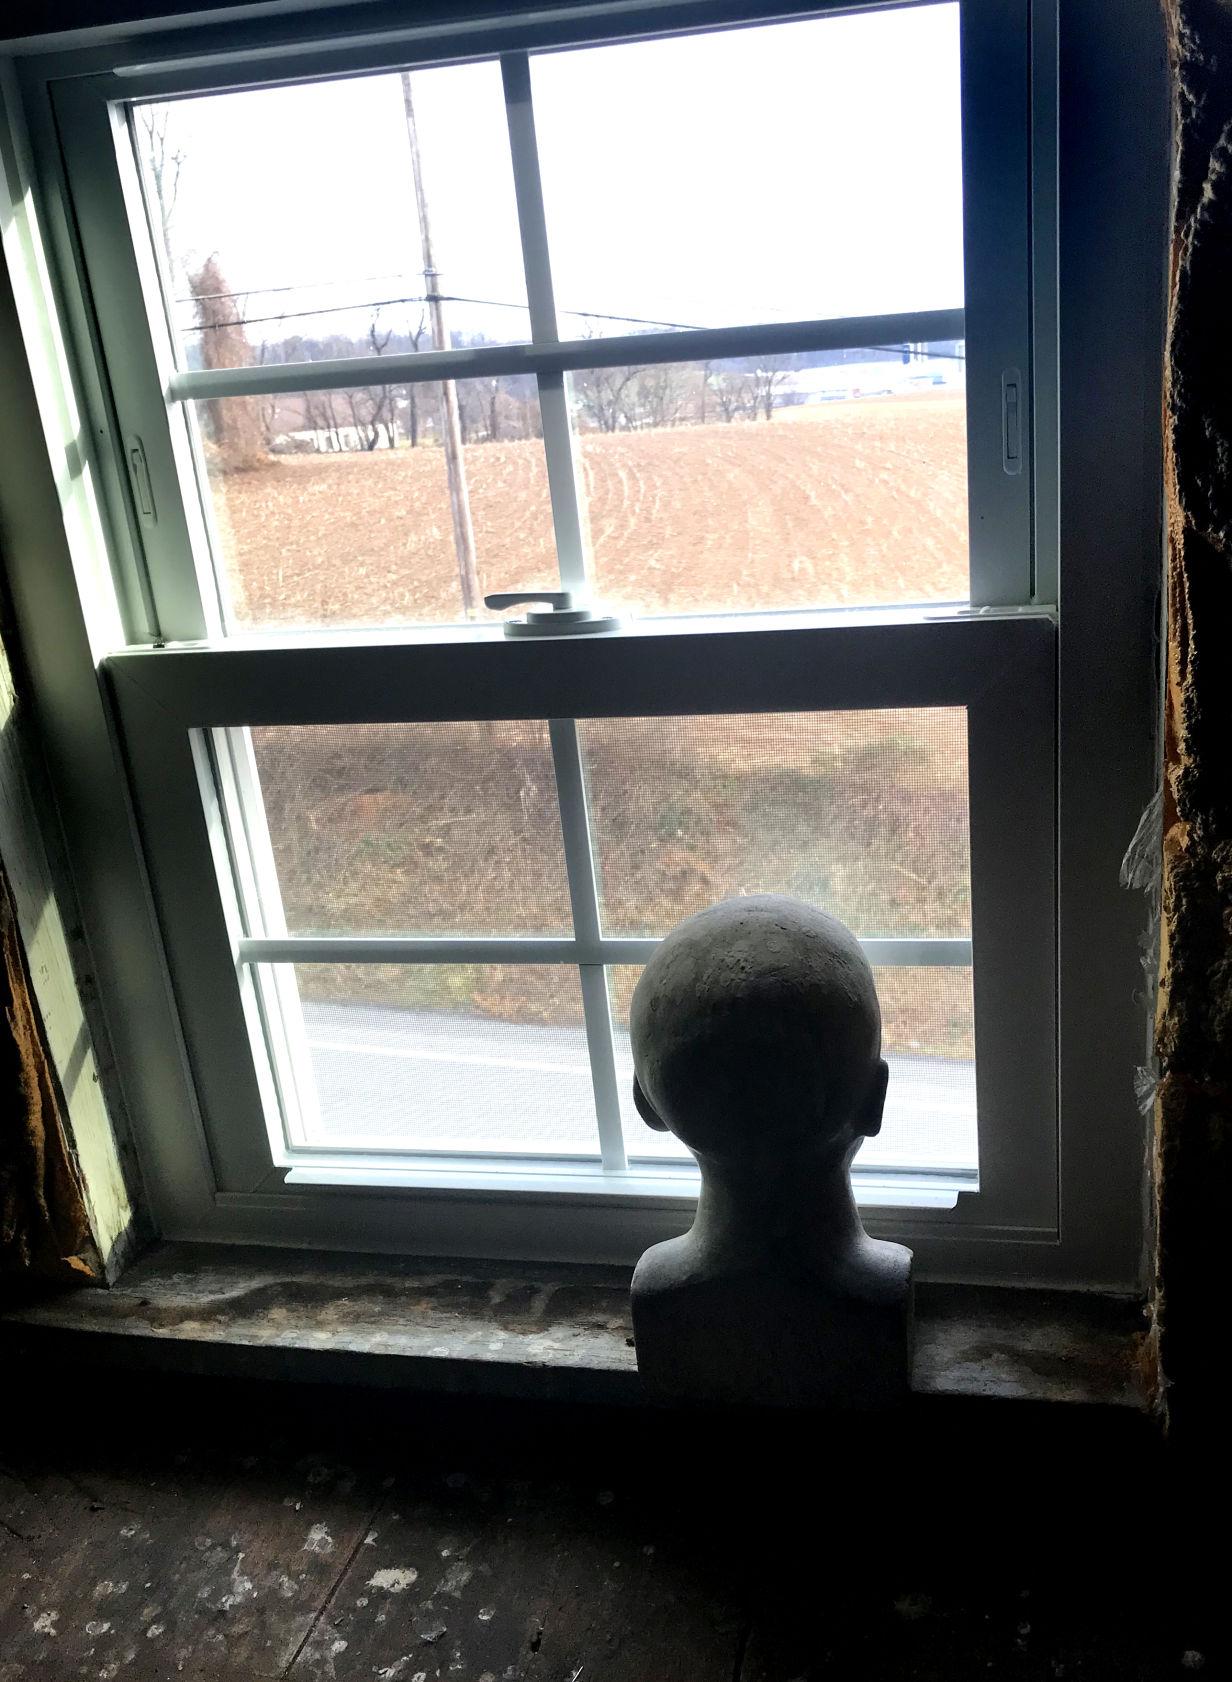 A head in the window